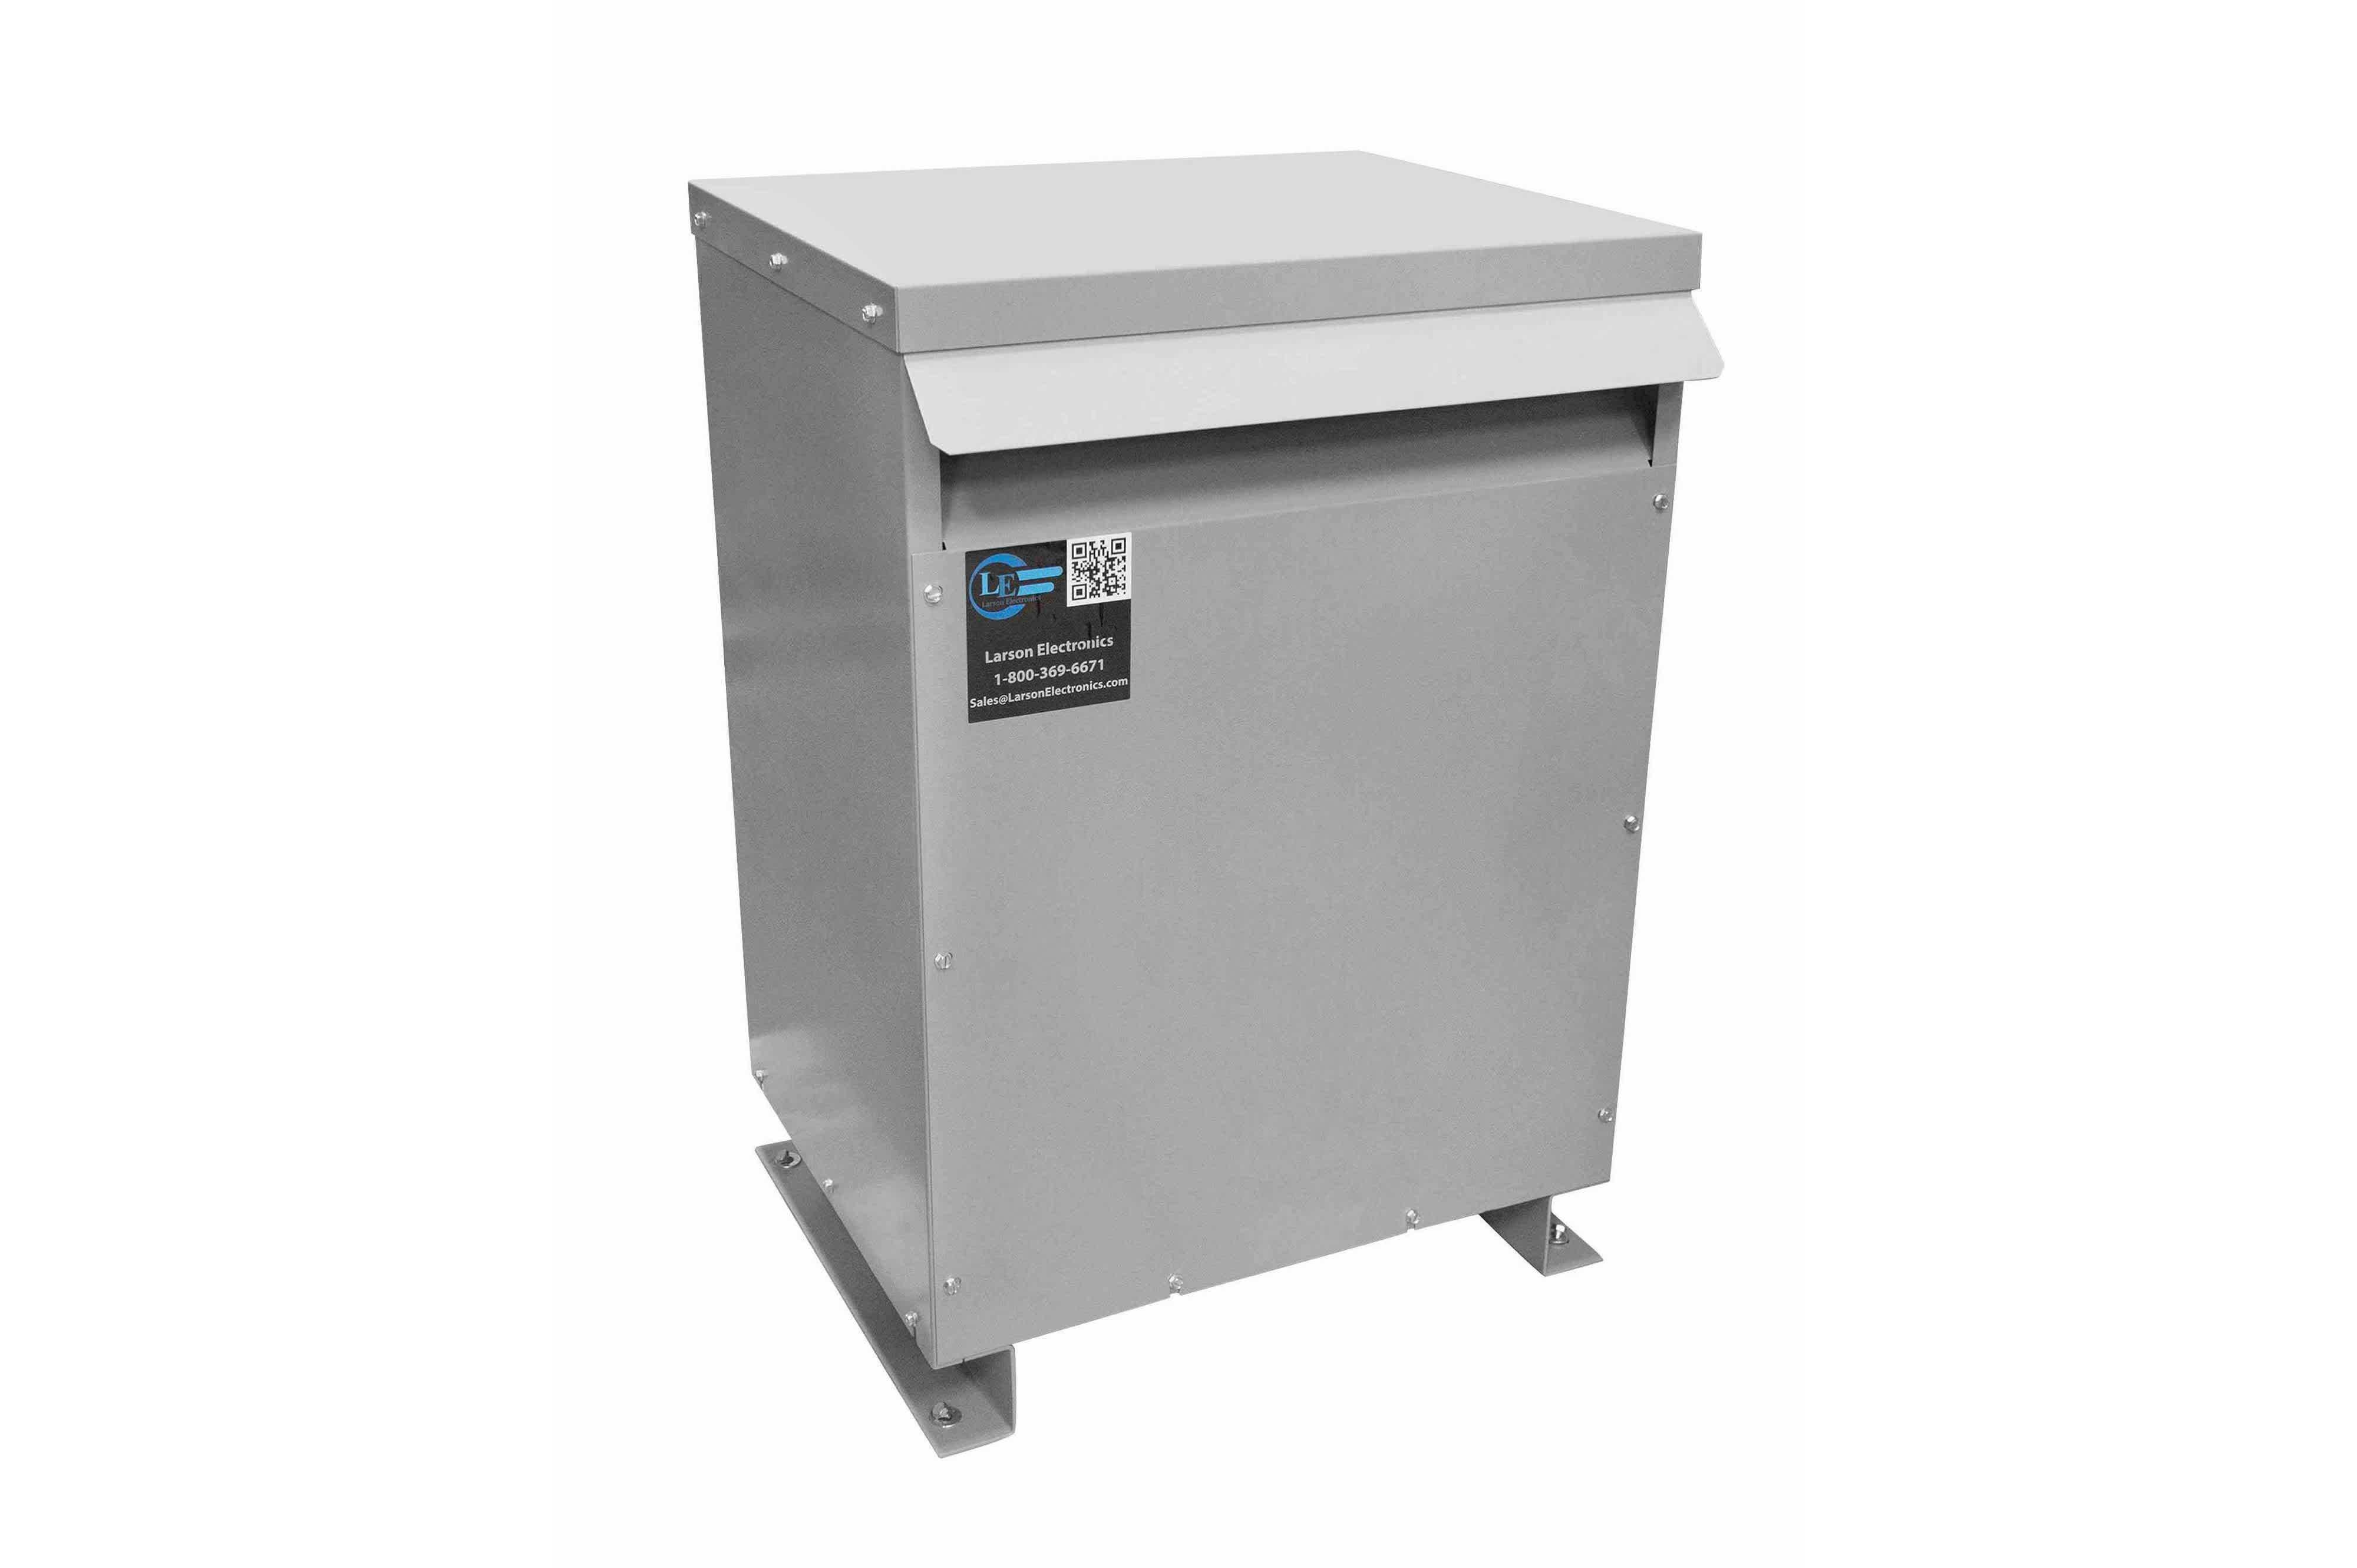 750 kVA 3PH Isolation Transformer, 460V Wye Primary, 400V Delta Secondary, N3R, Ventilated, 60 Hz